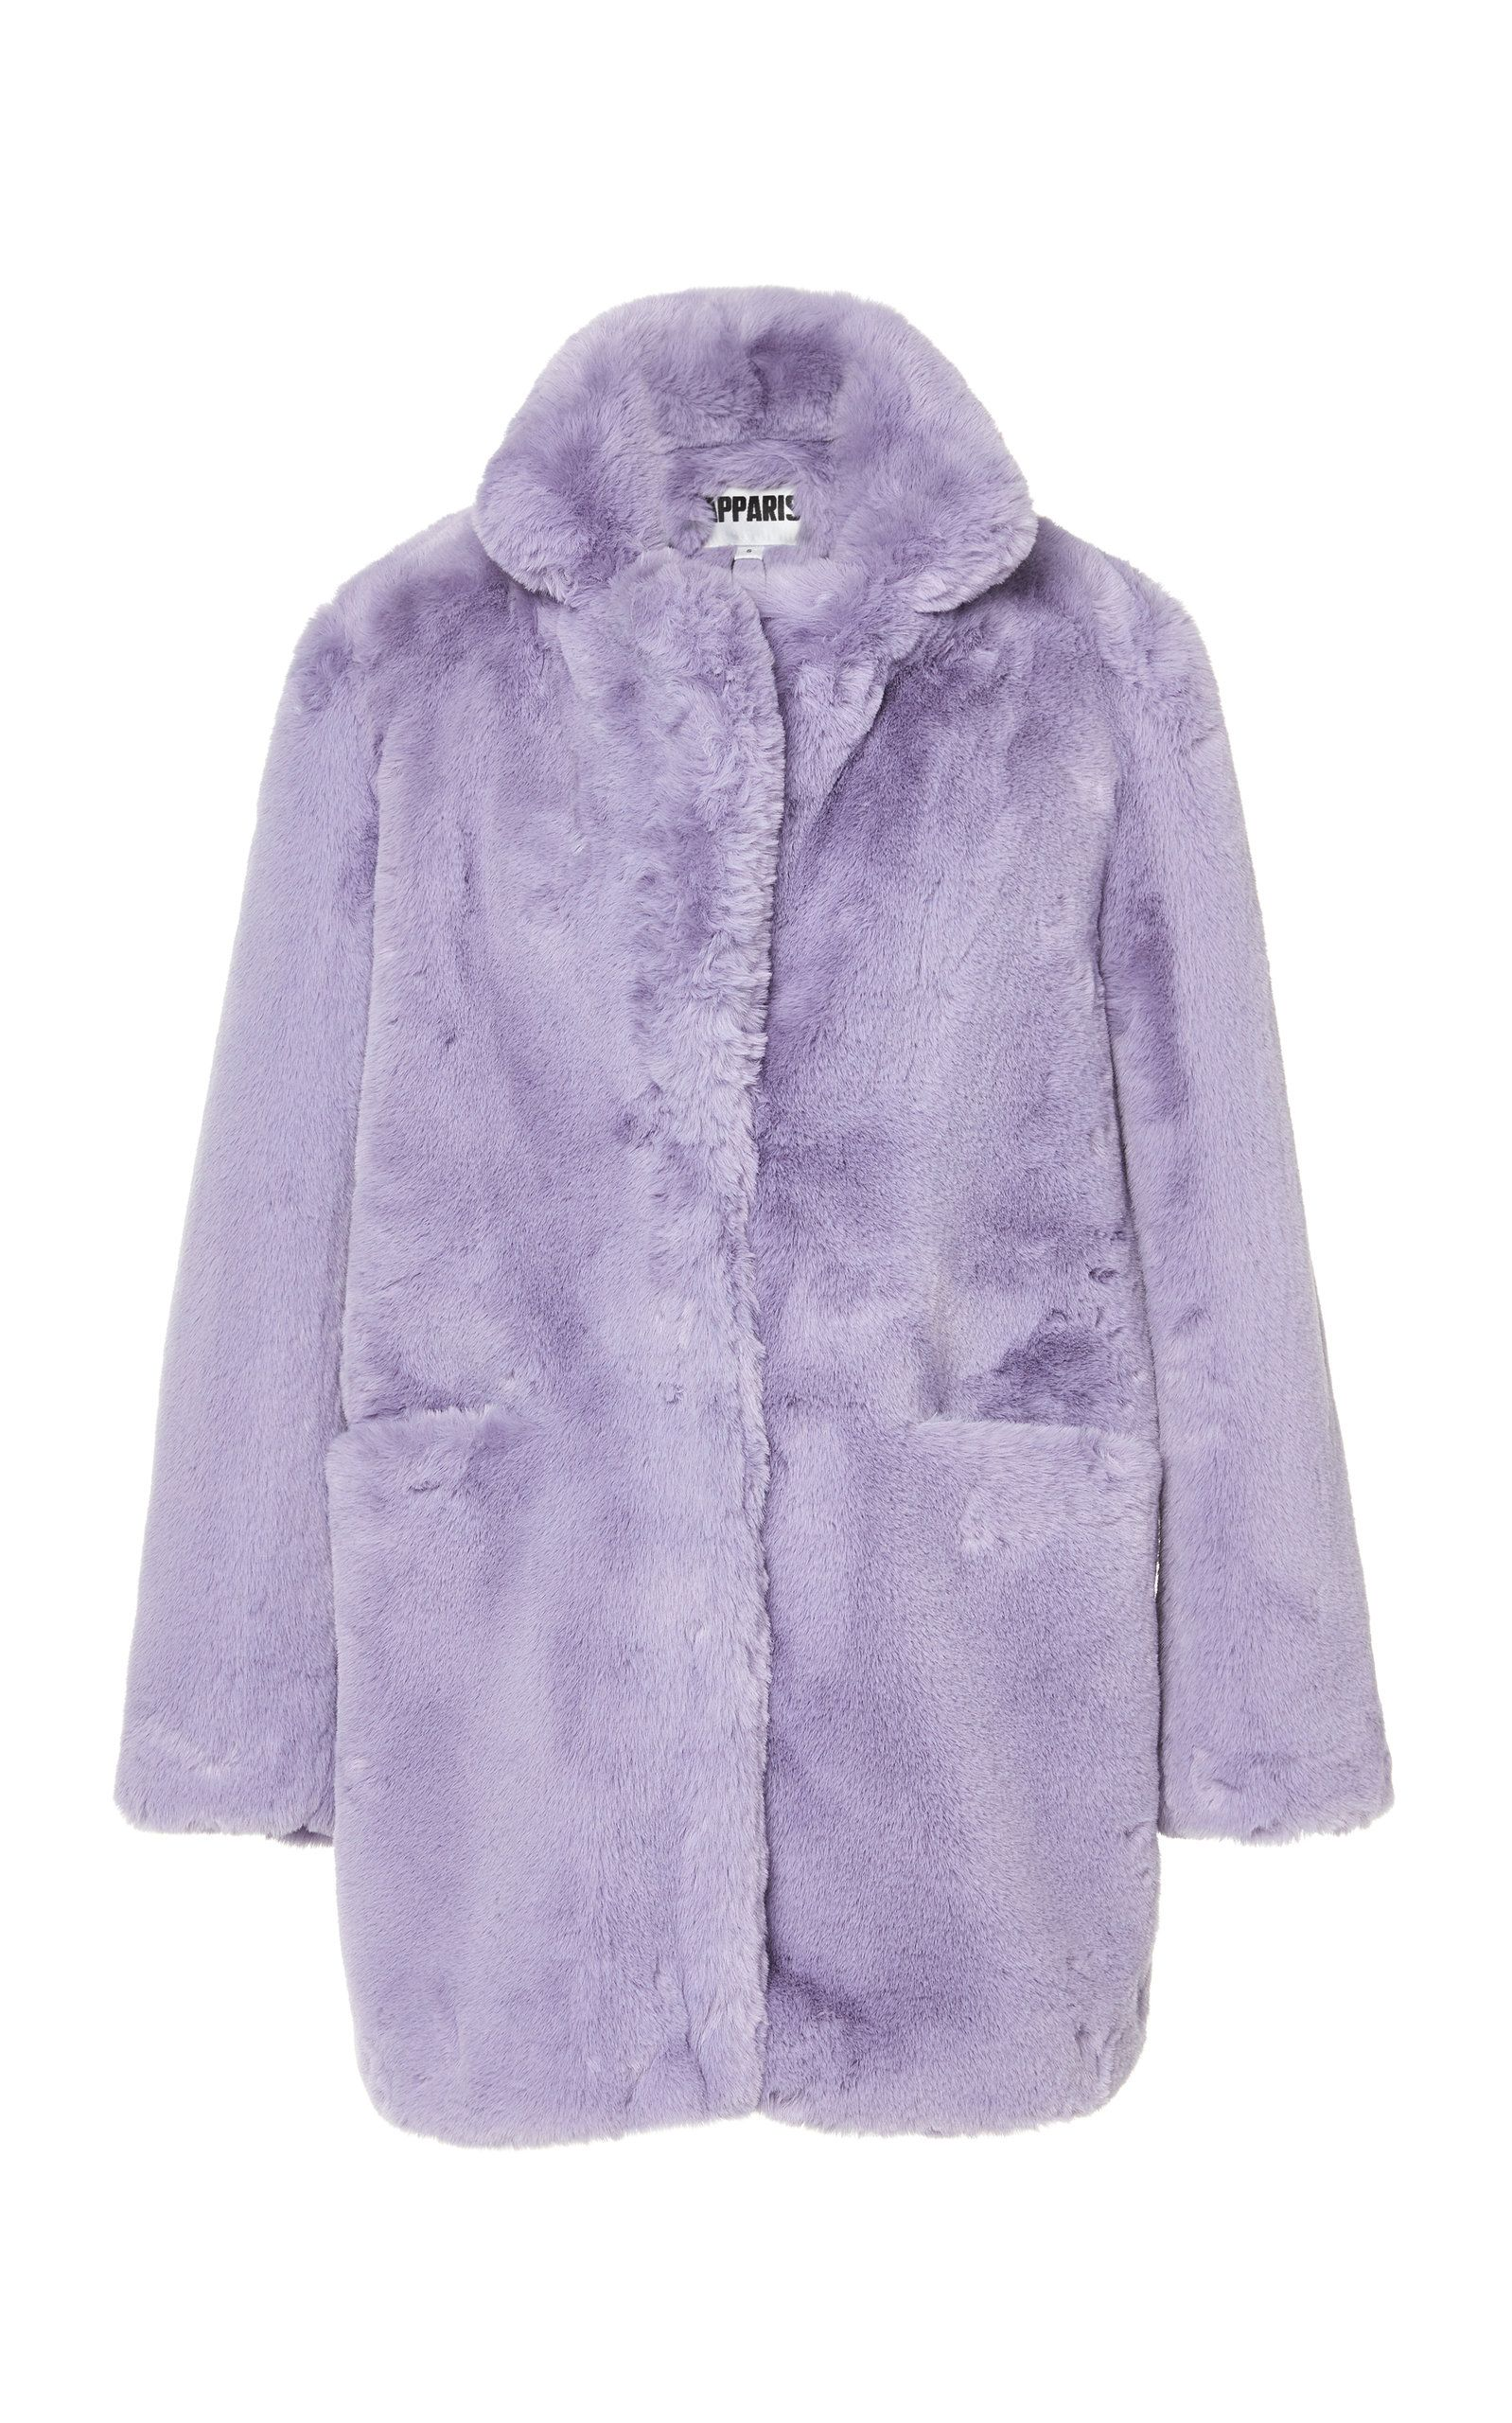 1b3fb3806892 Apparis Sophie Mid Length Coat in 2019 | Outerwear